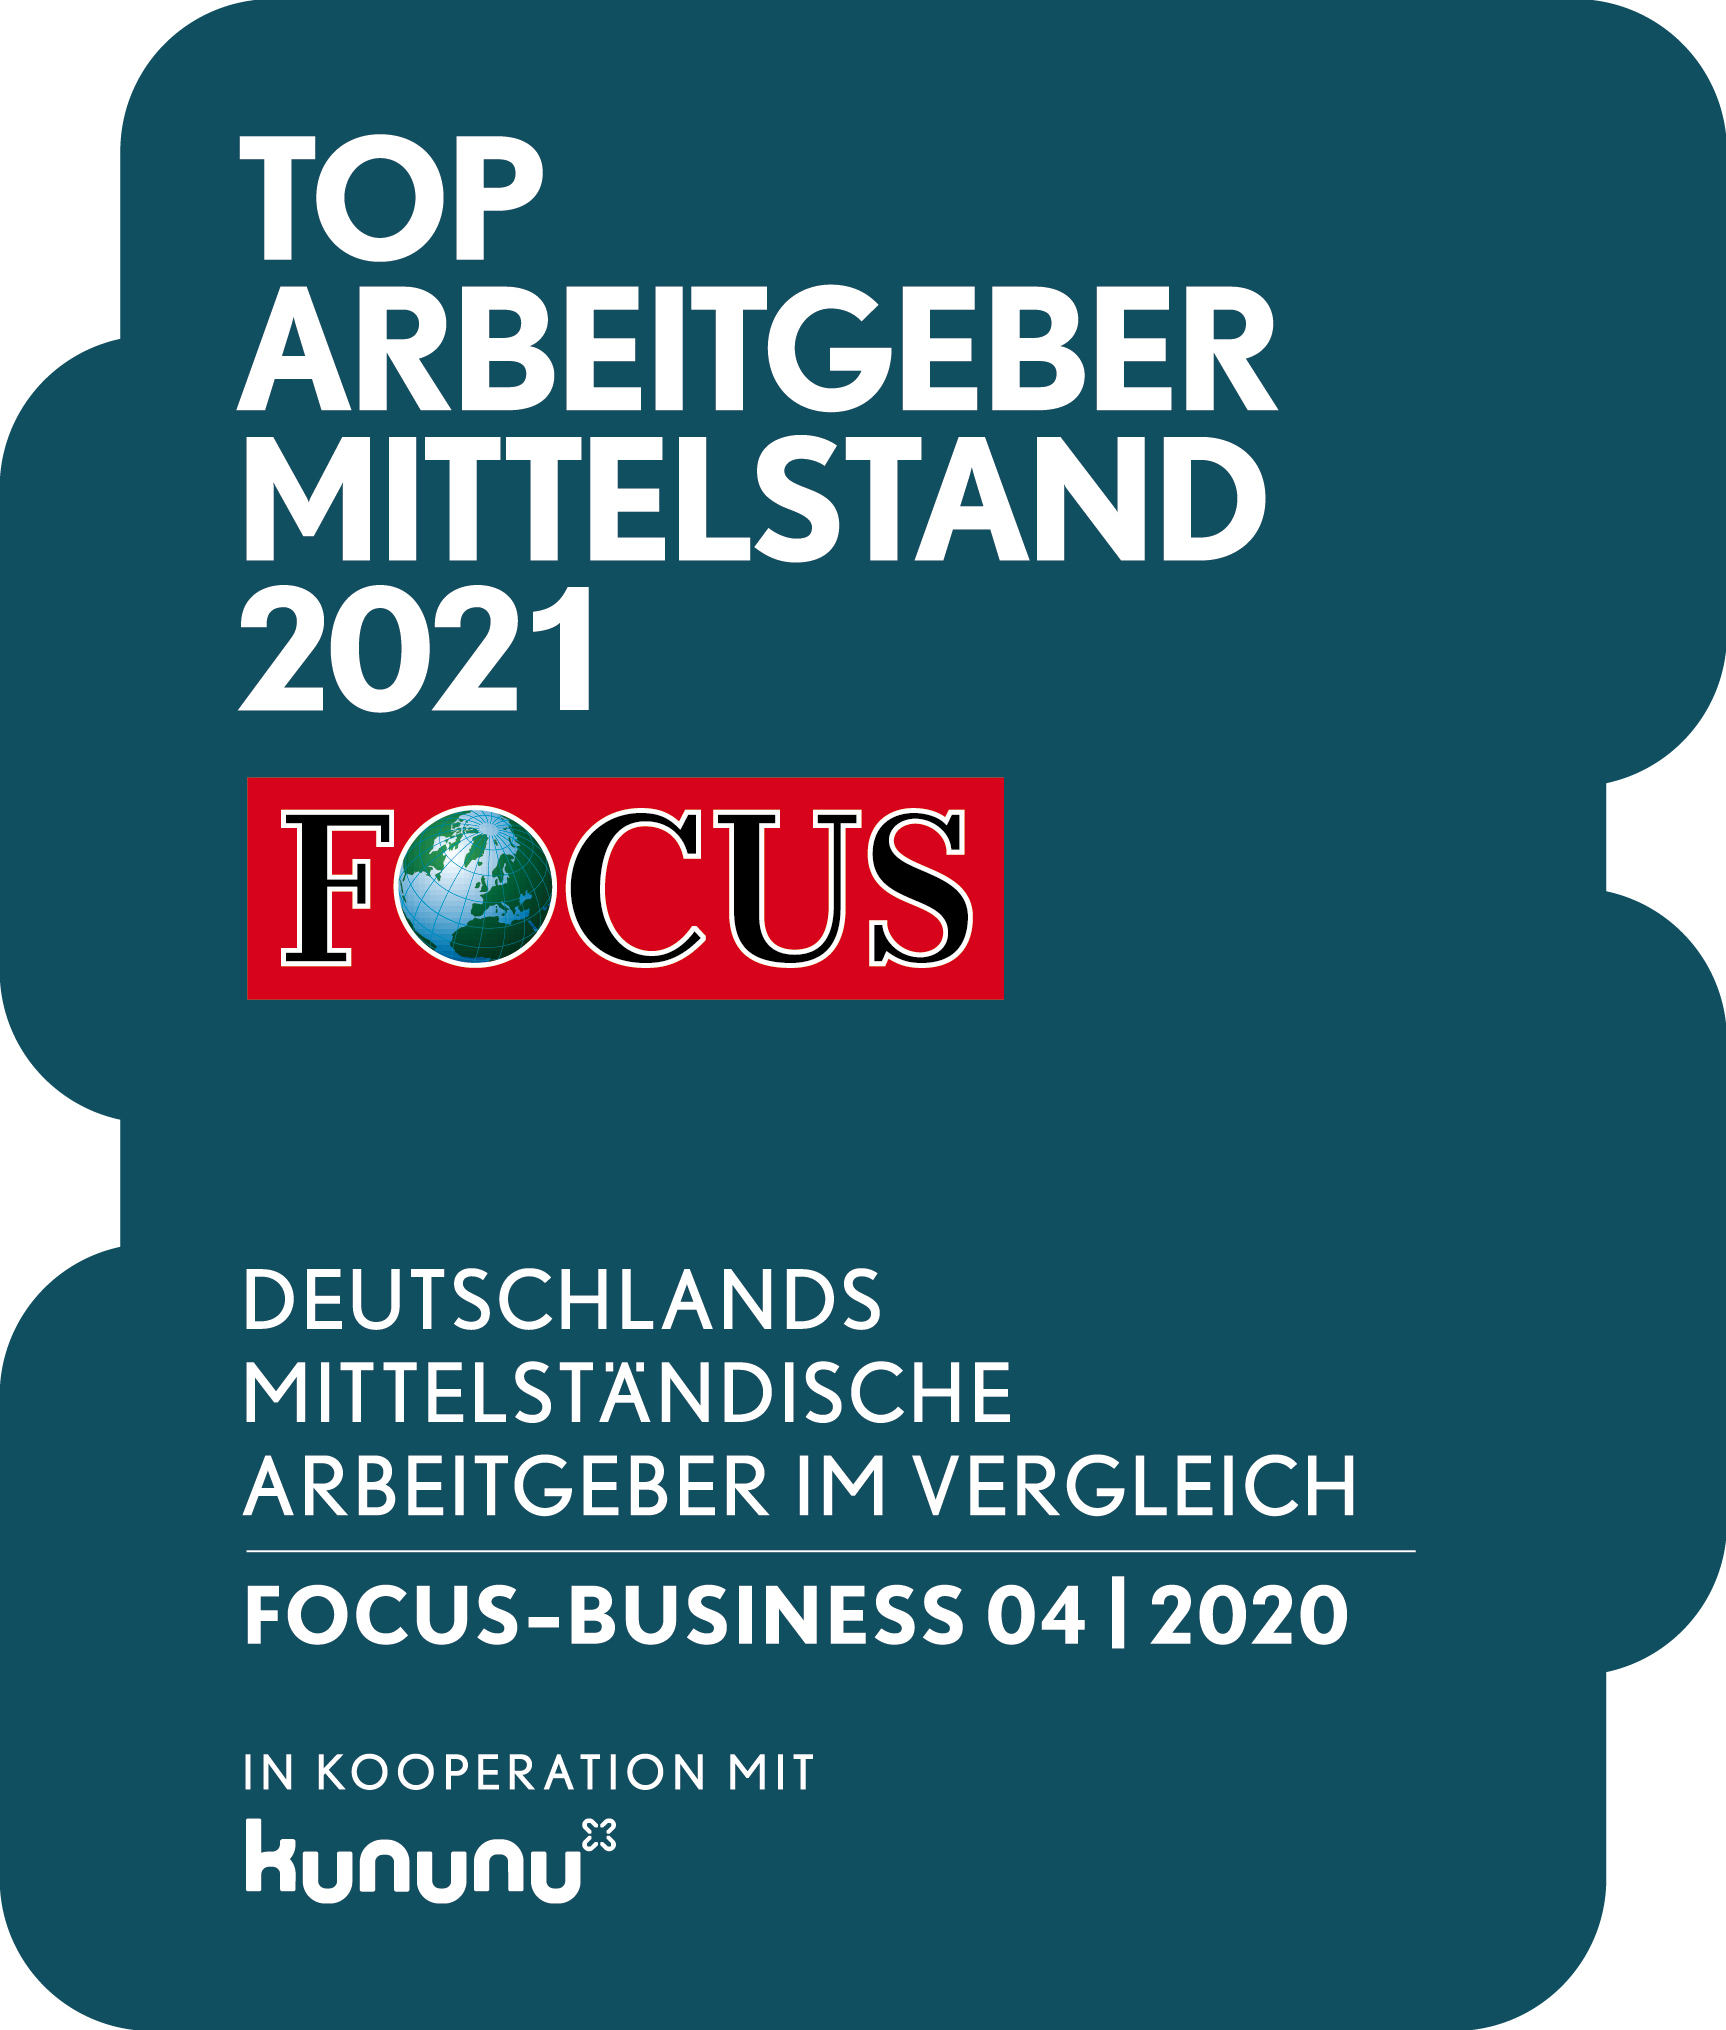 FCB_TOP_Arbeitgeber Mittelstand_2021_Ohne.jpg